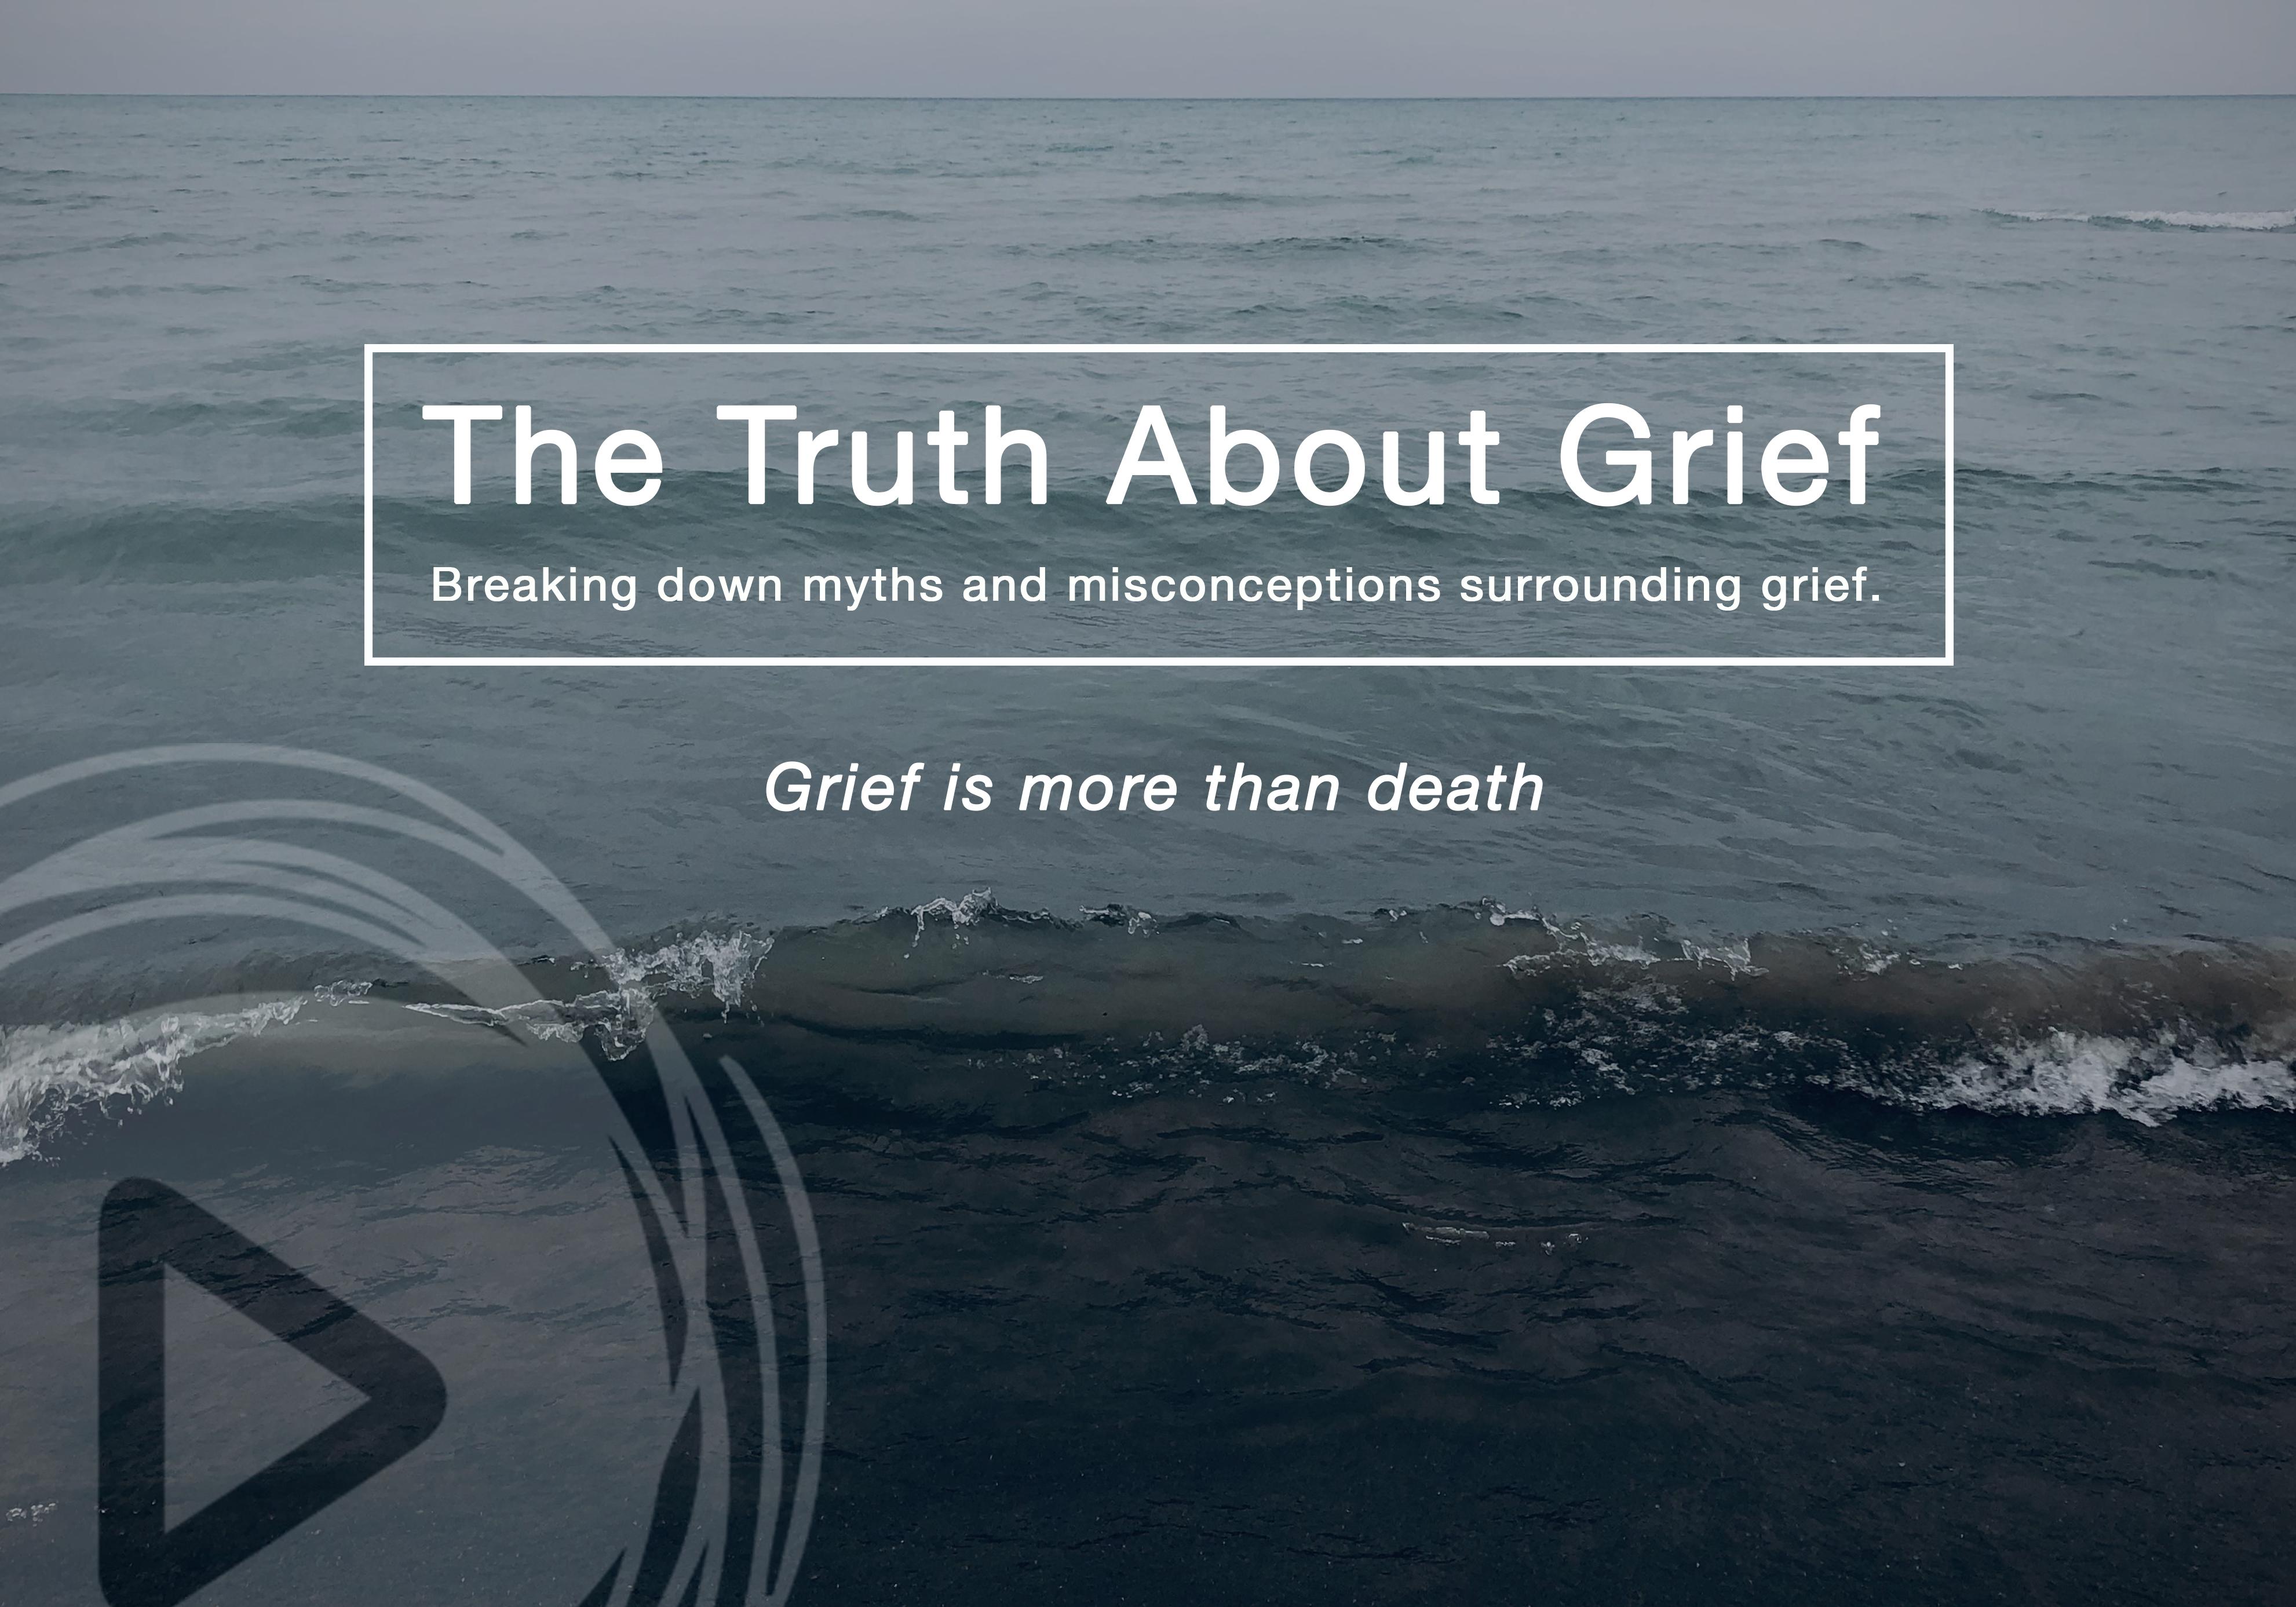 Marija - Grief is more than death